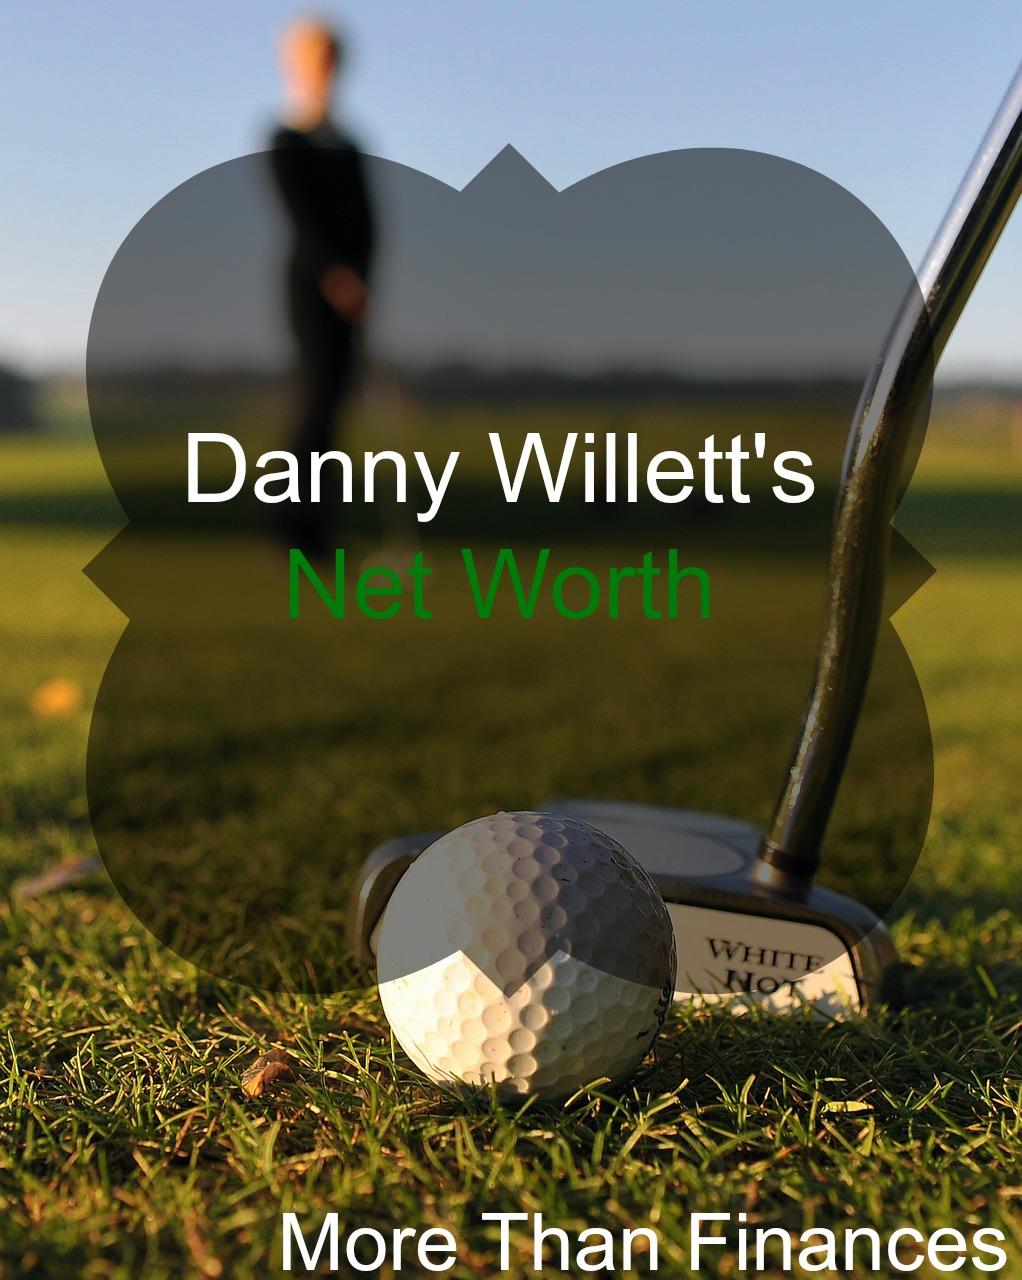 Danny Willett's Net Worth